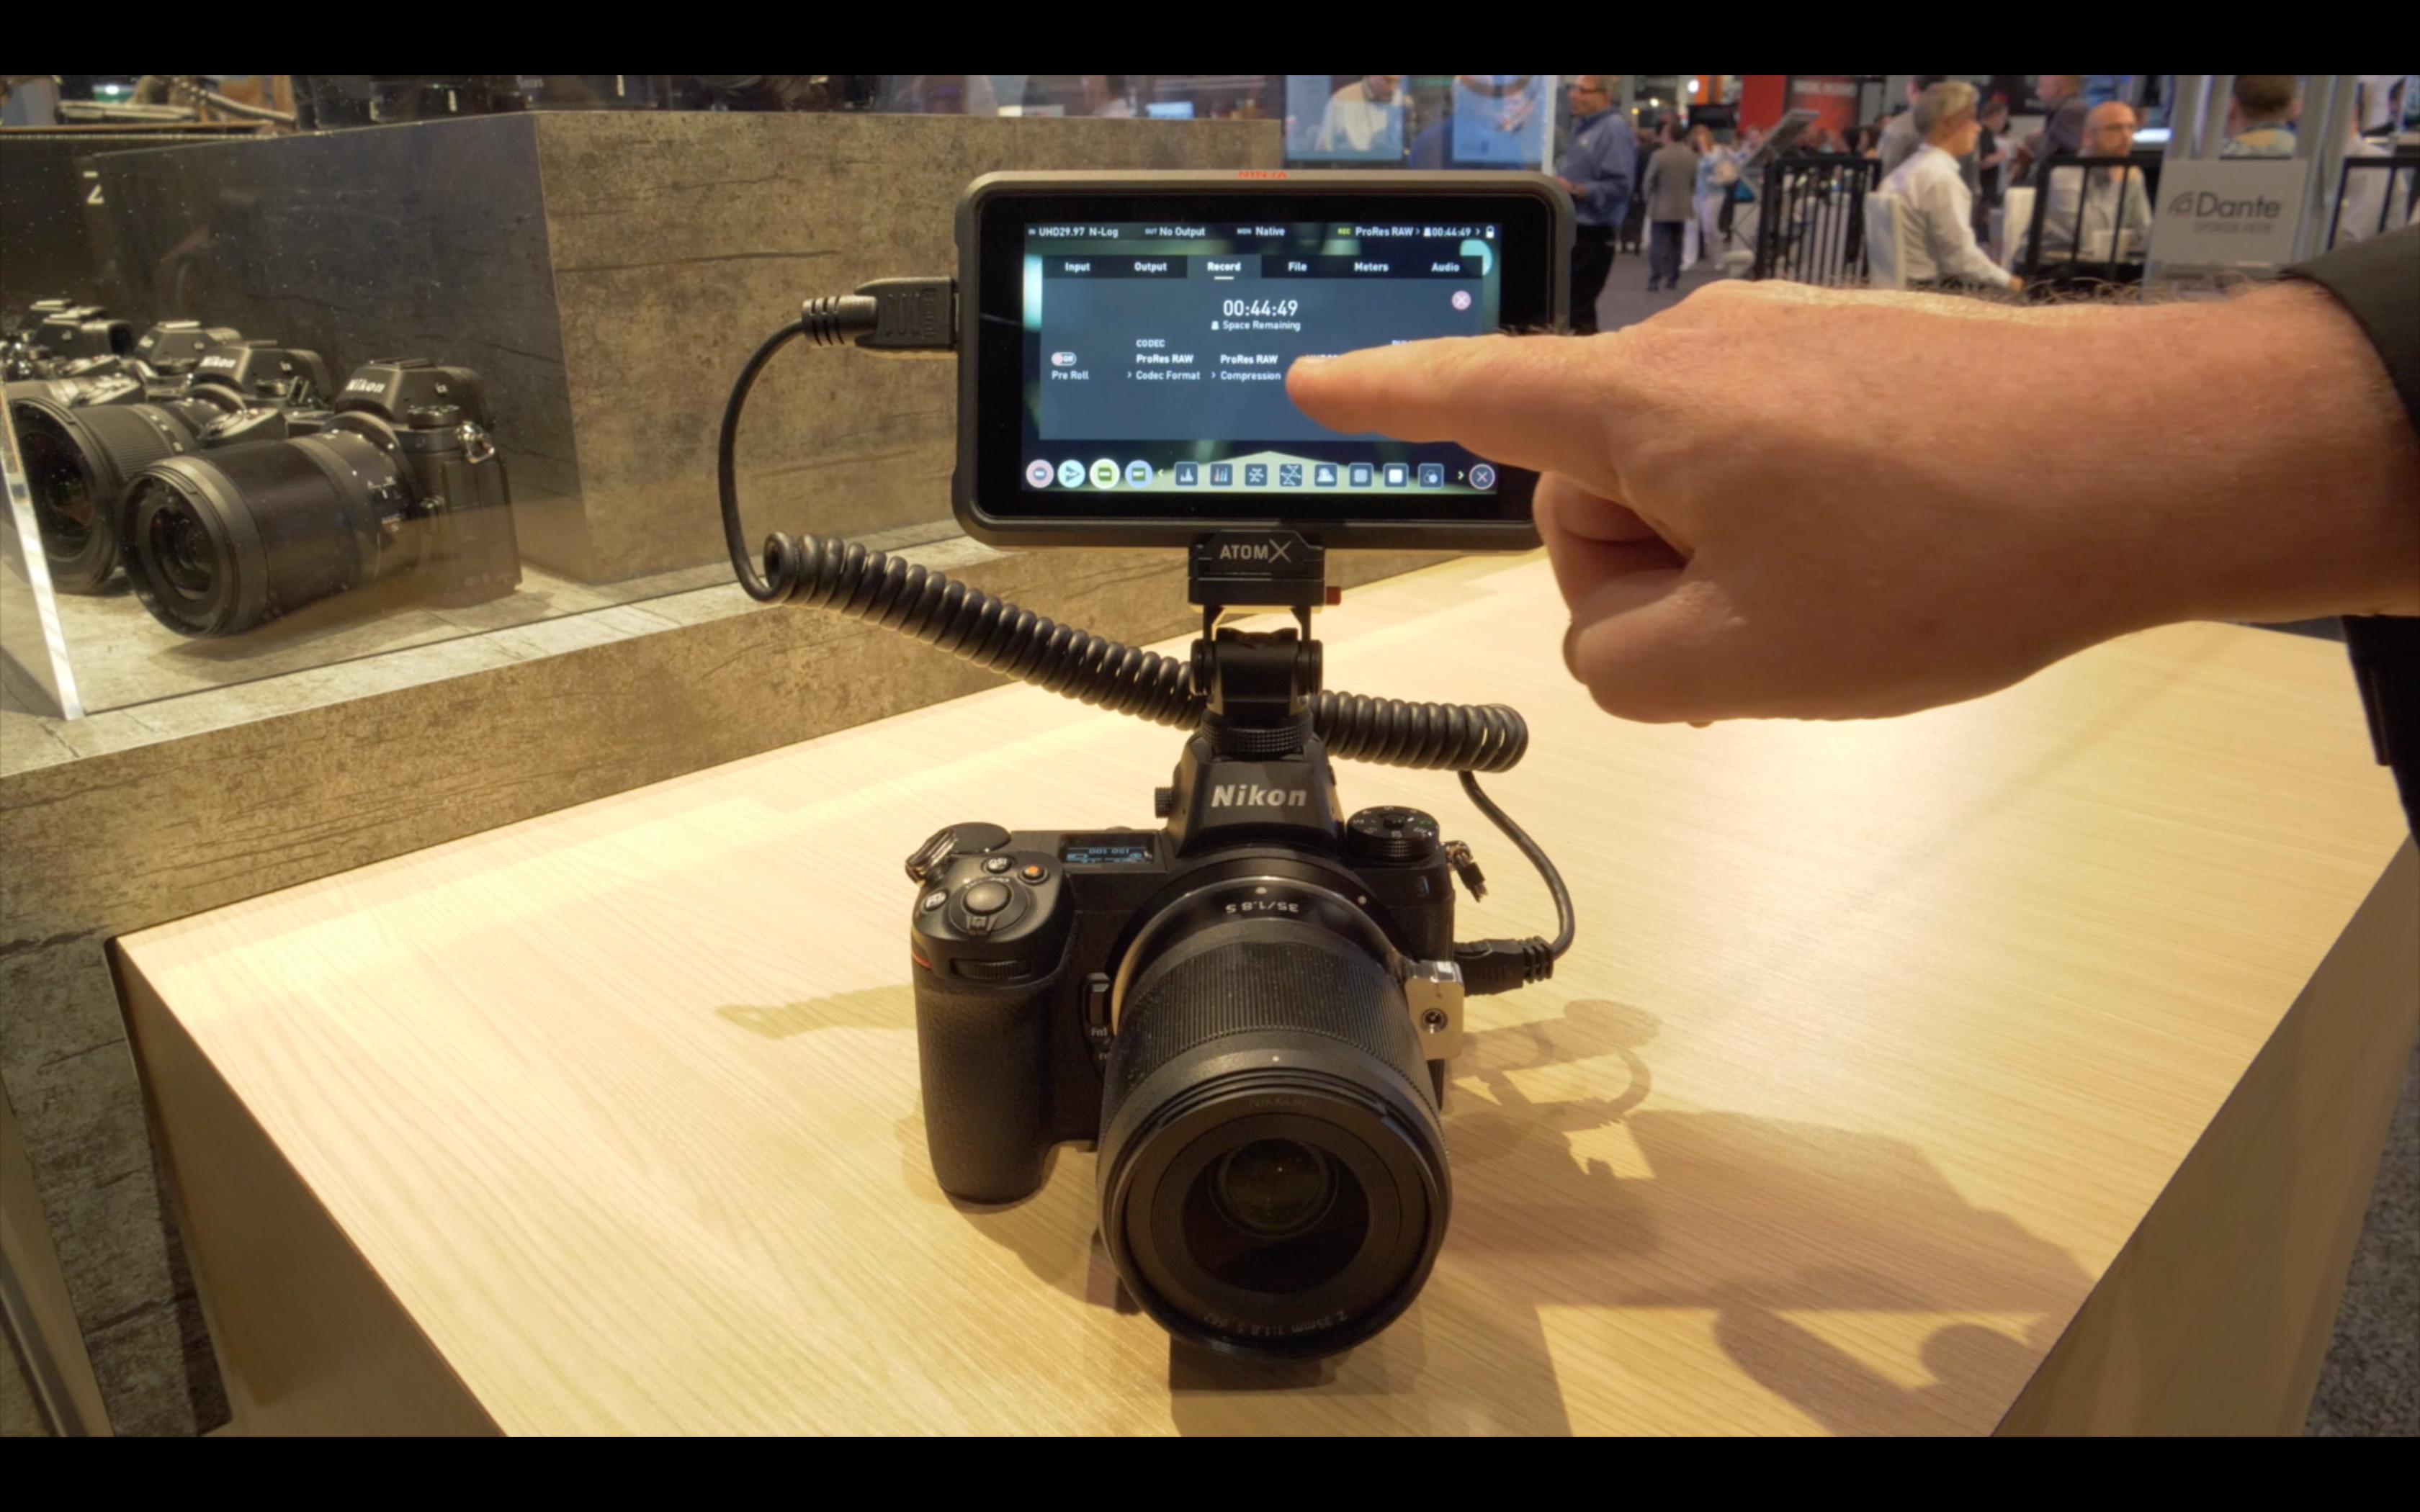 Nikon Z6 and ProRes RAW on the Atomos Ninja V via HDMI // NAB 2019